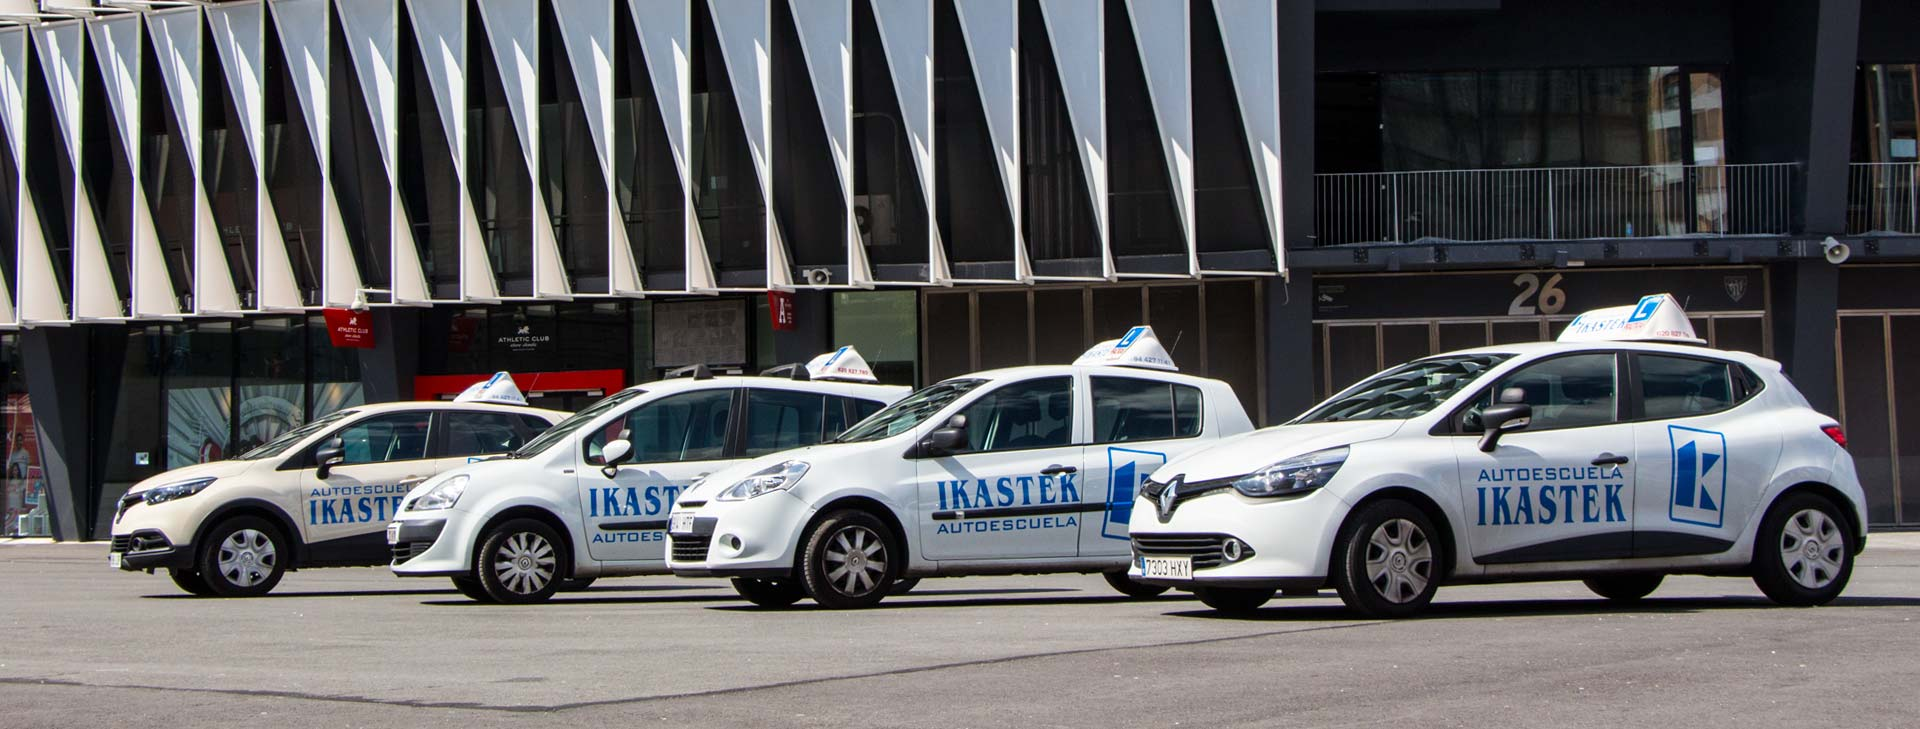 flota de coches autoescuela ikastek bilbao clases practicas volante